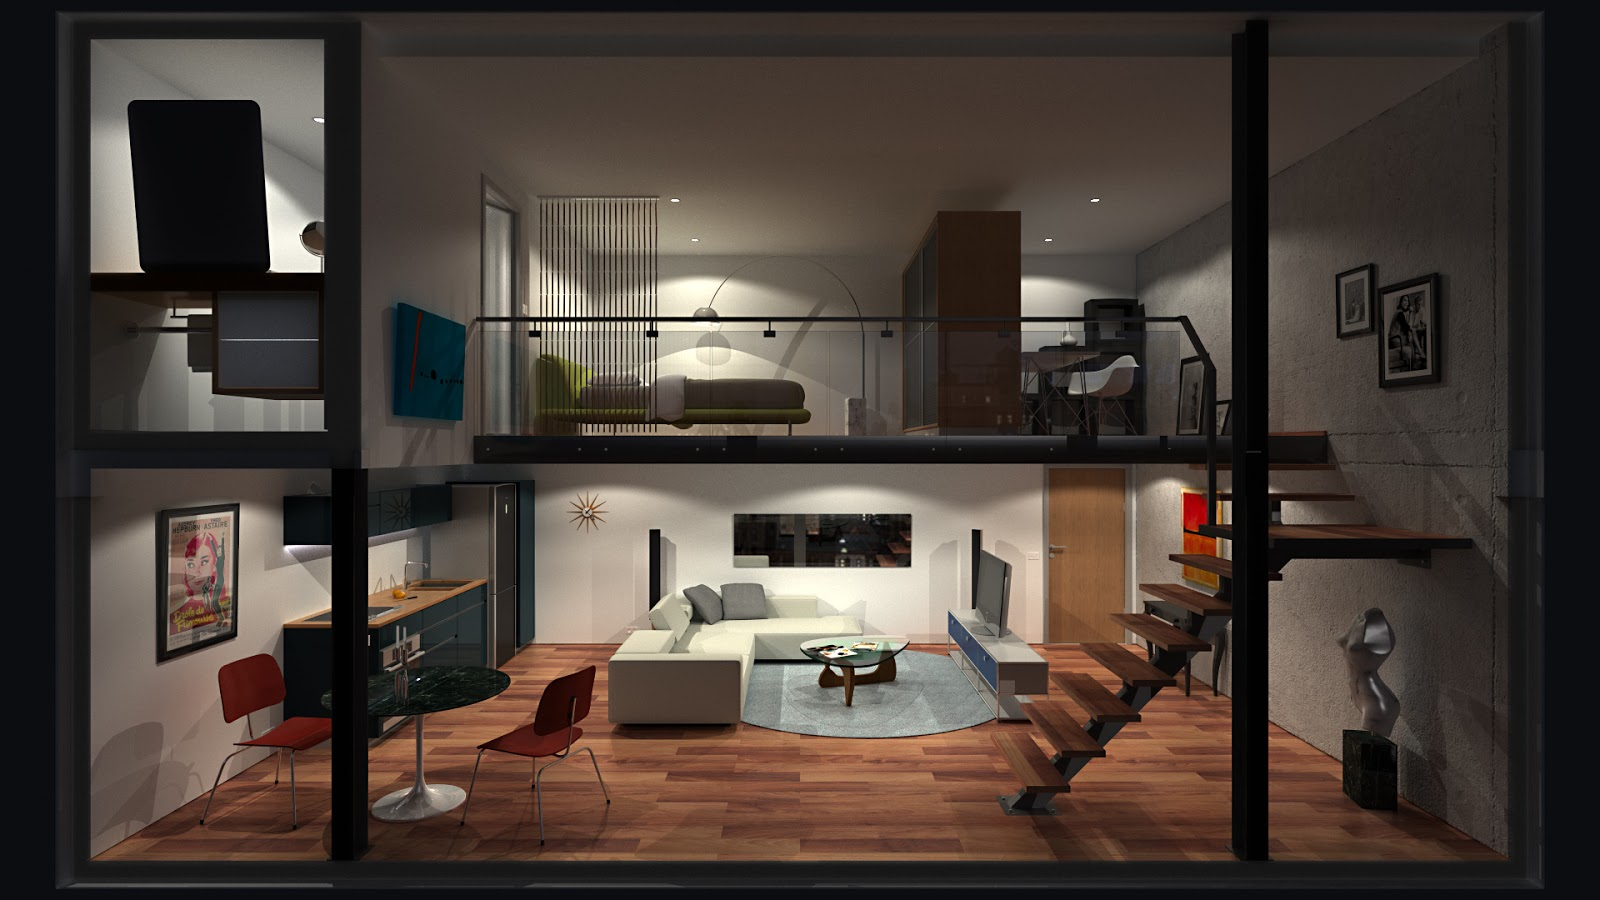 Quais as principais diferen as entre os tipos de apartamentos reciclar e decorar blog de - Fotos de lofts decorados ...